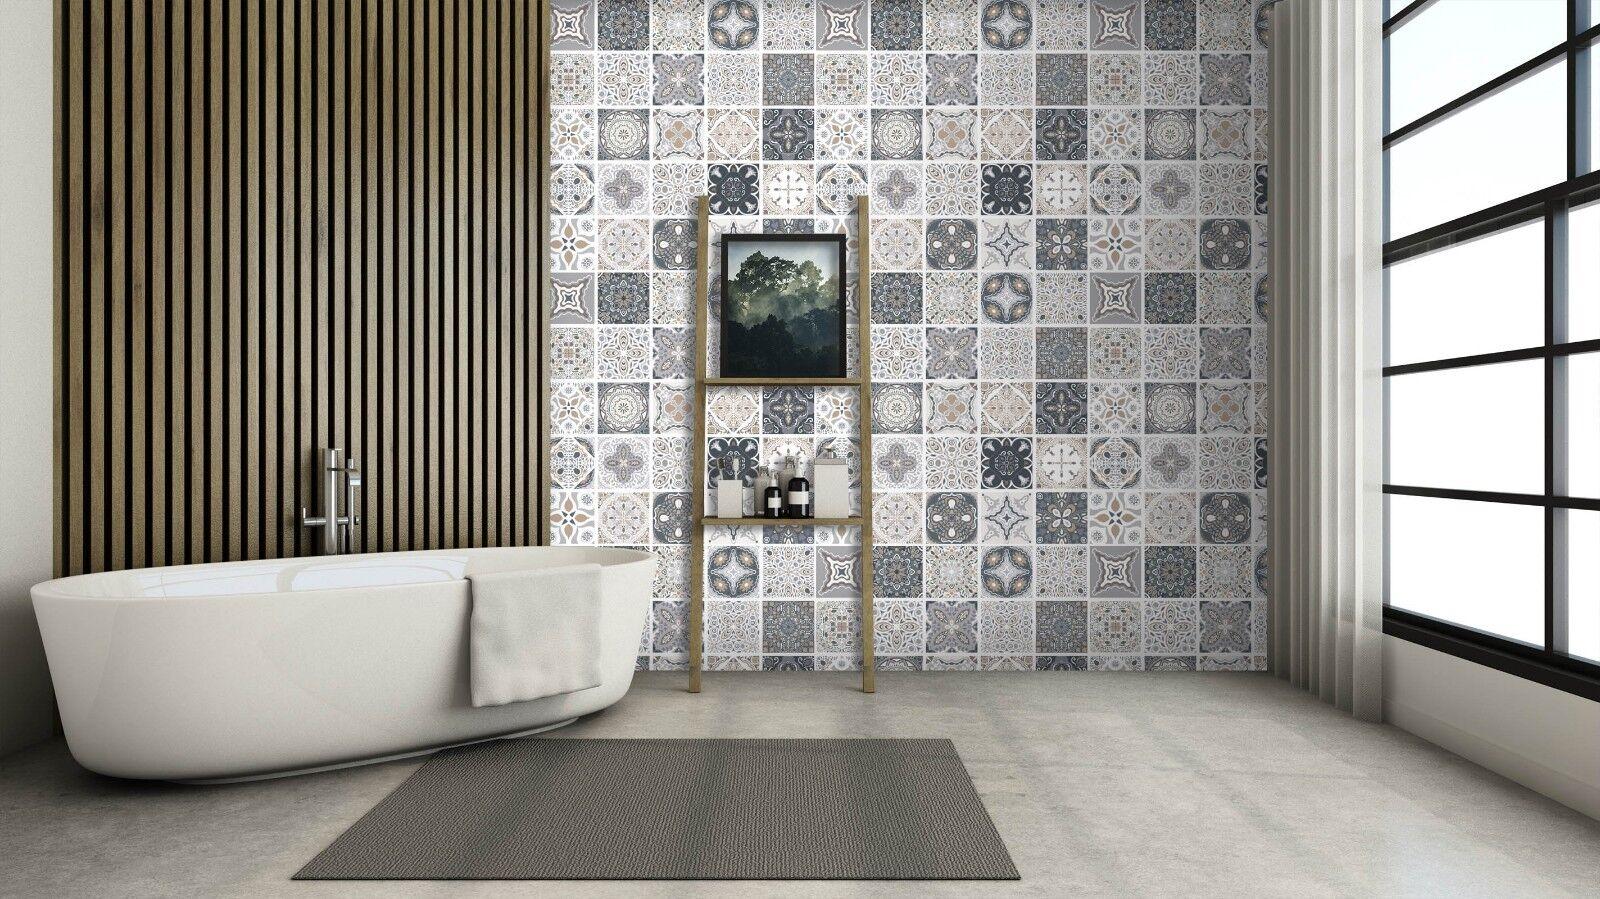 3D Muster Graue Blaume 8 Textur Fliesen Marmor Tapeten Abziehbild Tapete Wandbild